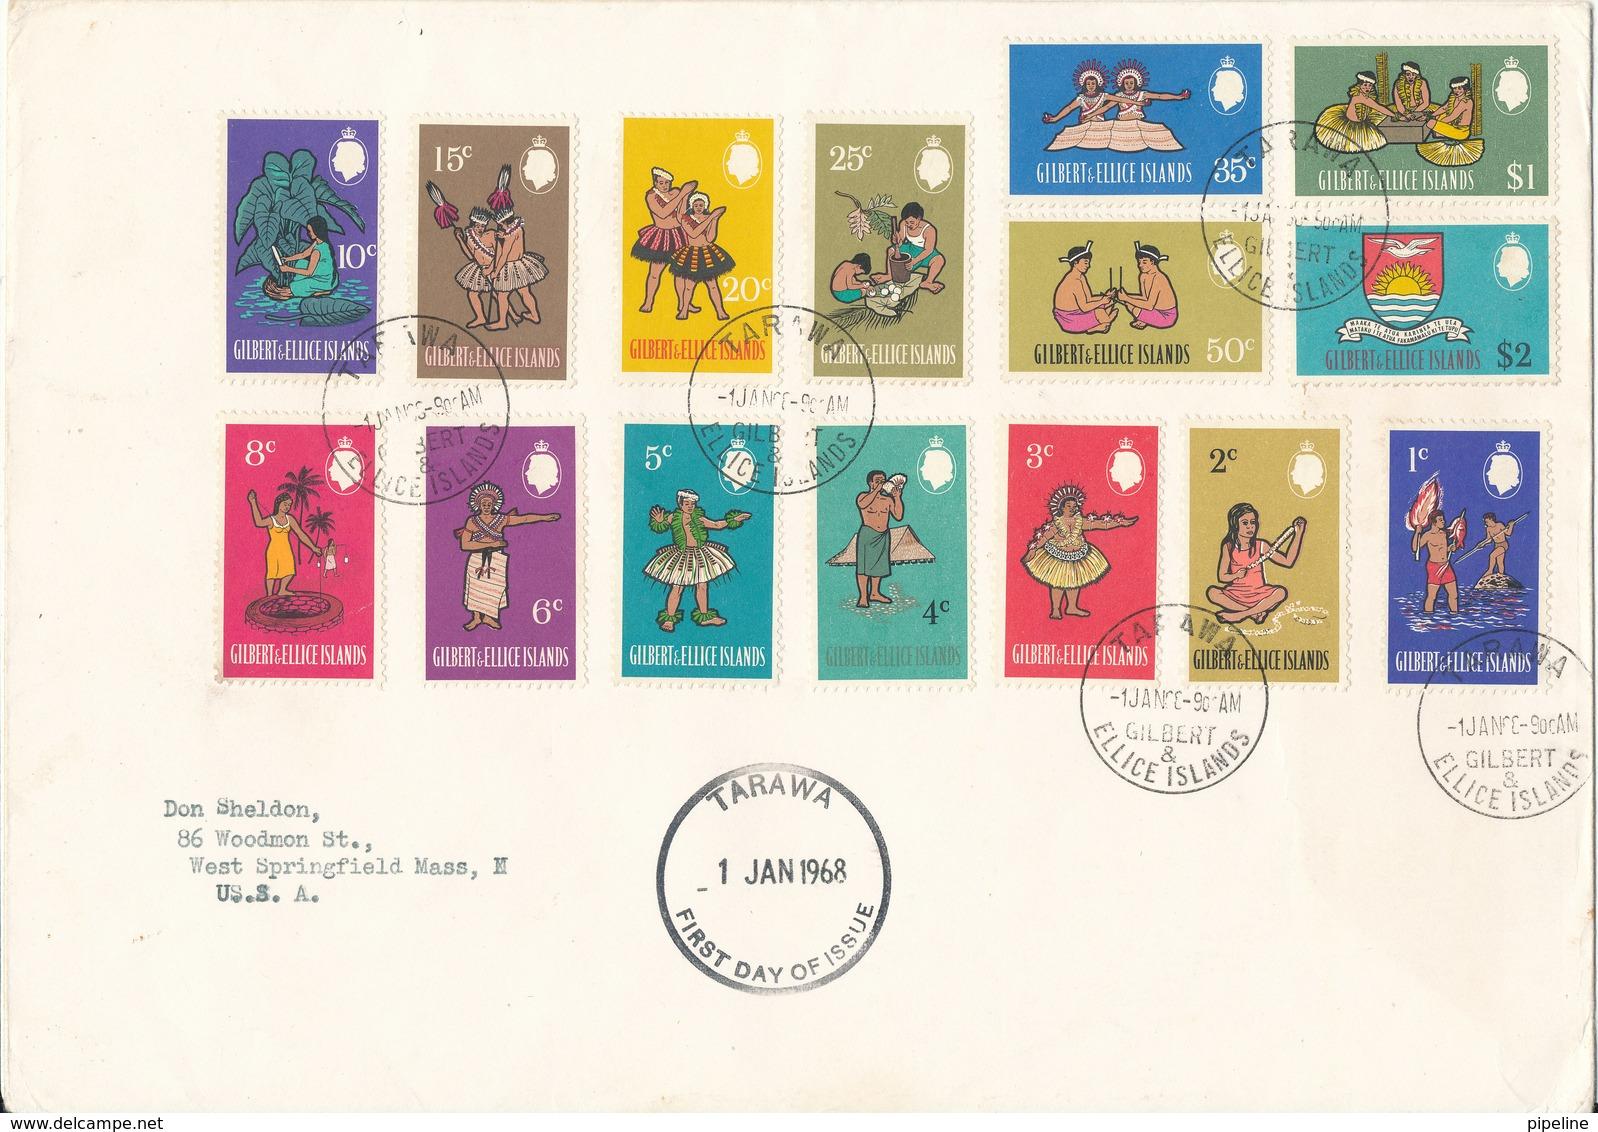 Gilbert Ellice Islands FDC 1-1-1968 Definitives Complete Set Of 15 Stamps Sent To USA - Gilbert & Ellice Islands (...-1979)